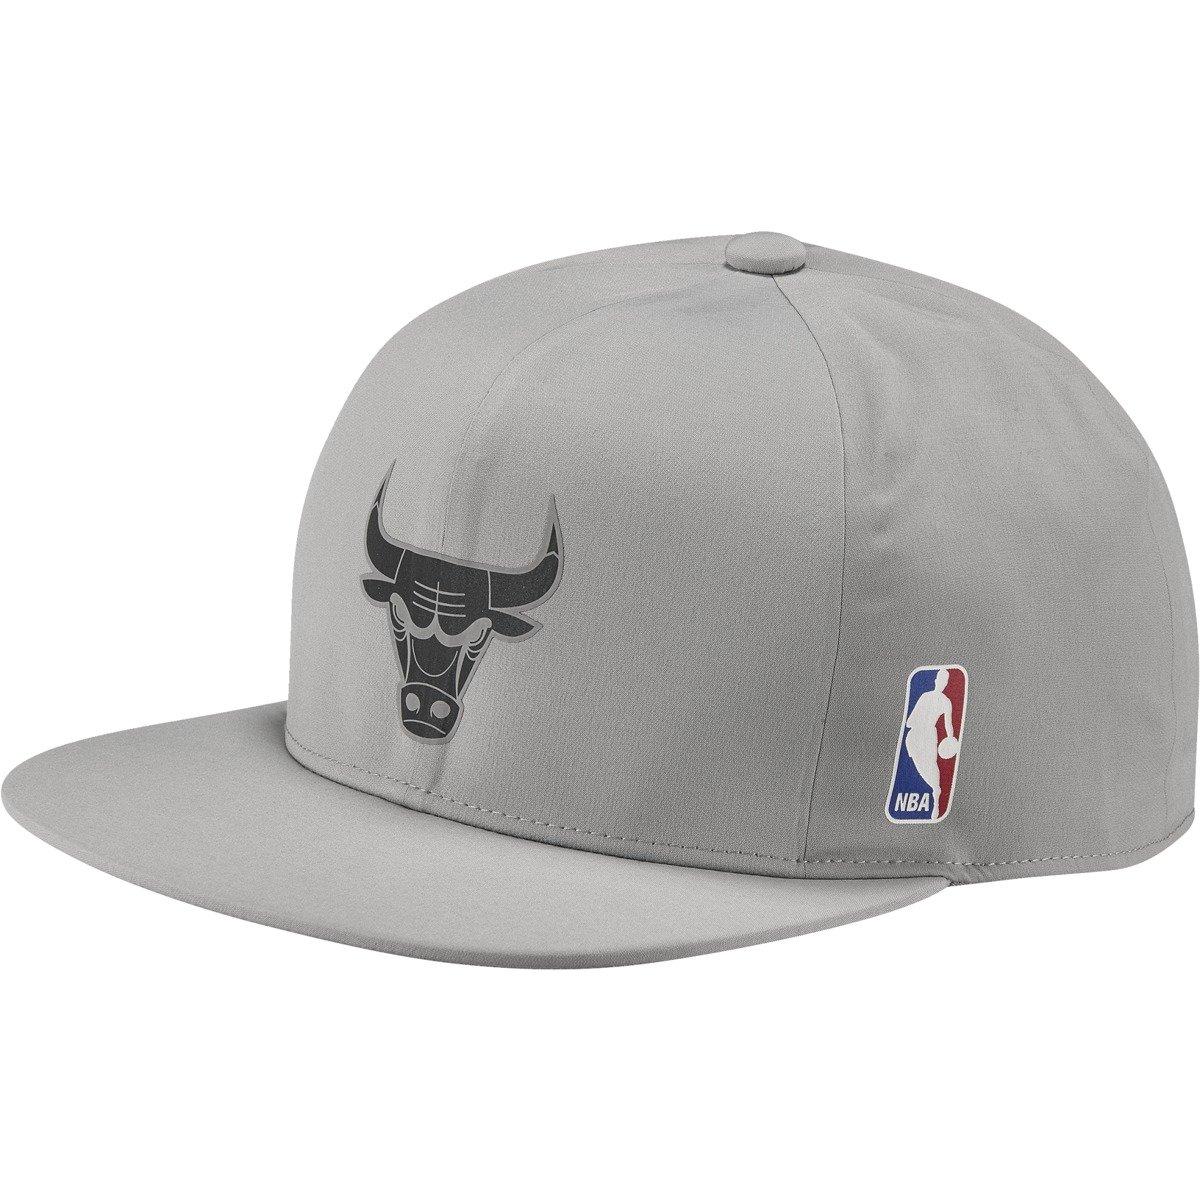 NBA Adidas Chicago Bulls Snapback Berretto - BK7413 Clicca per espandere ... 9b44ee0b075c